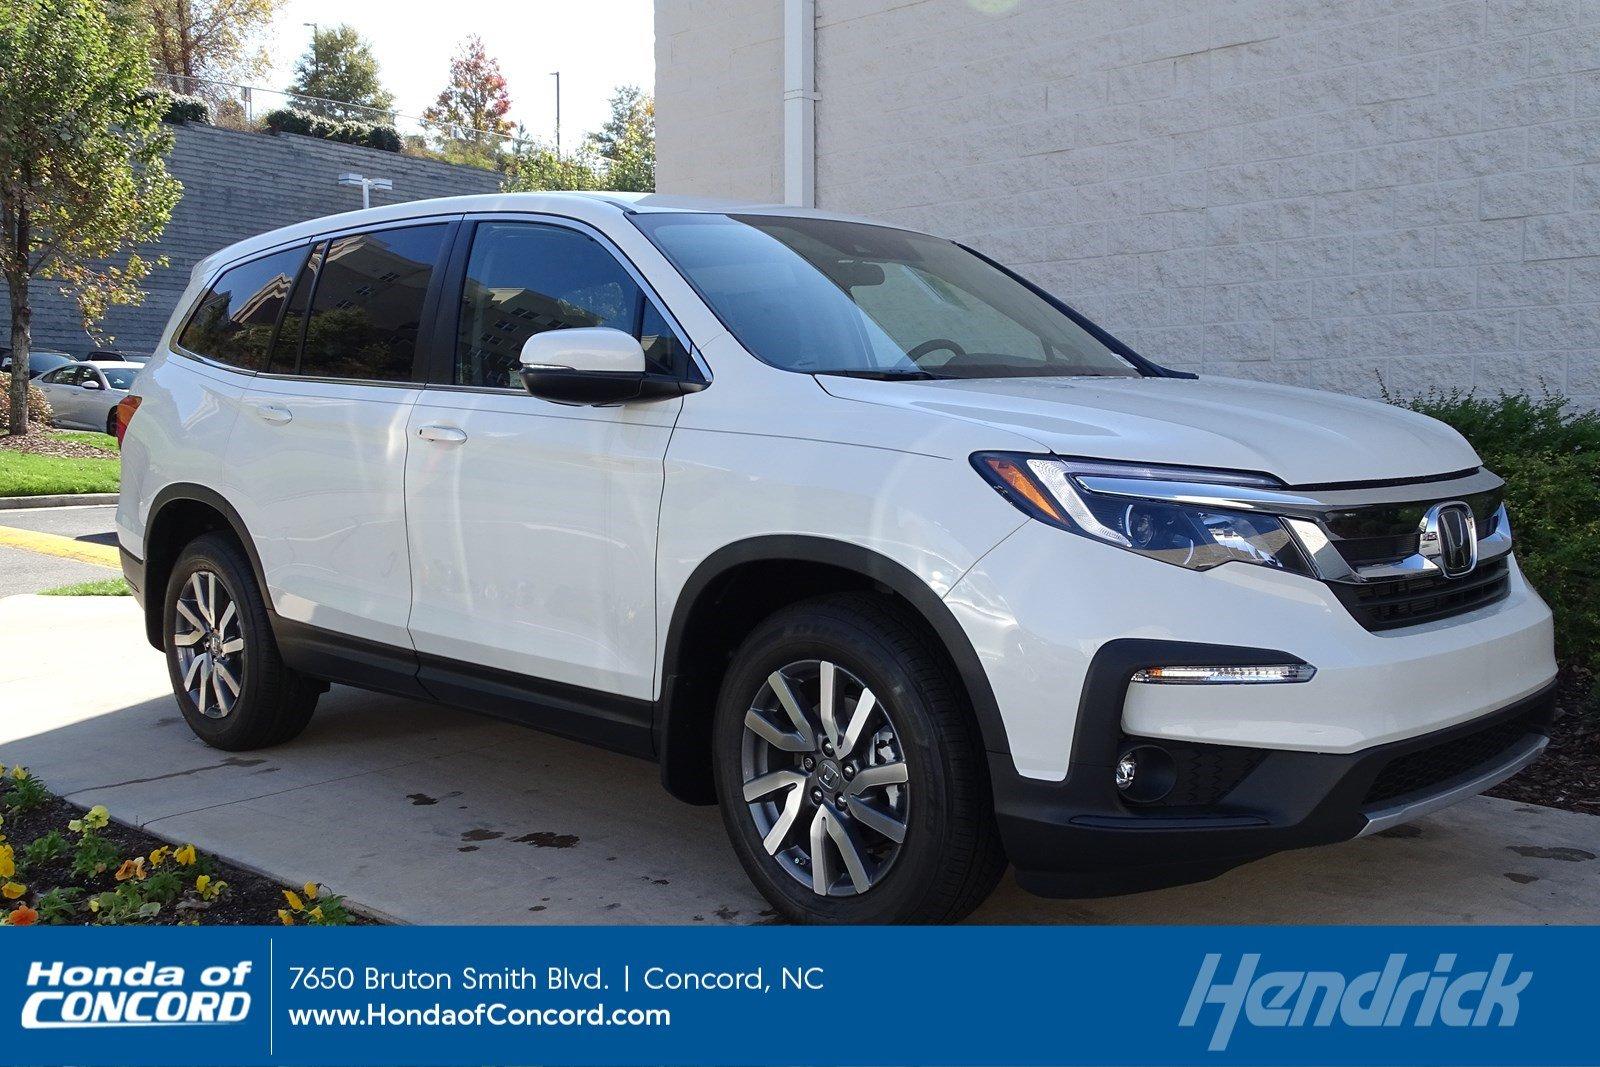 2019 Honda Pilot SUV